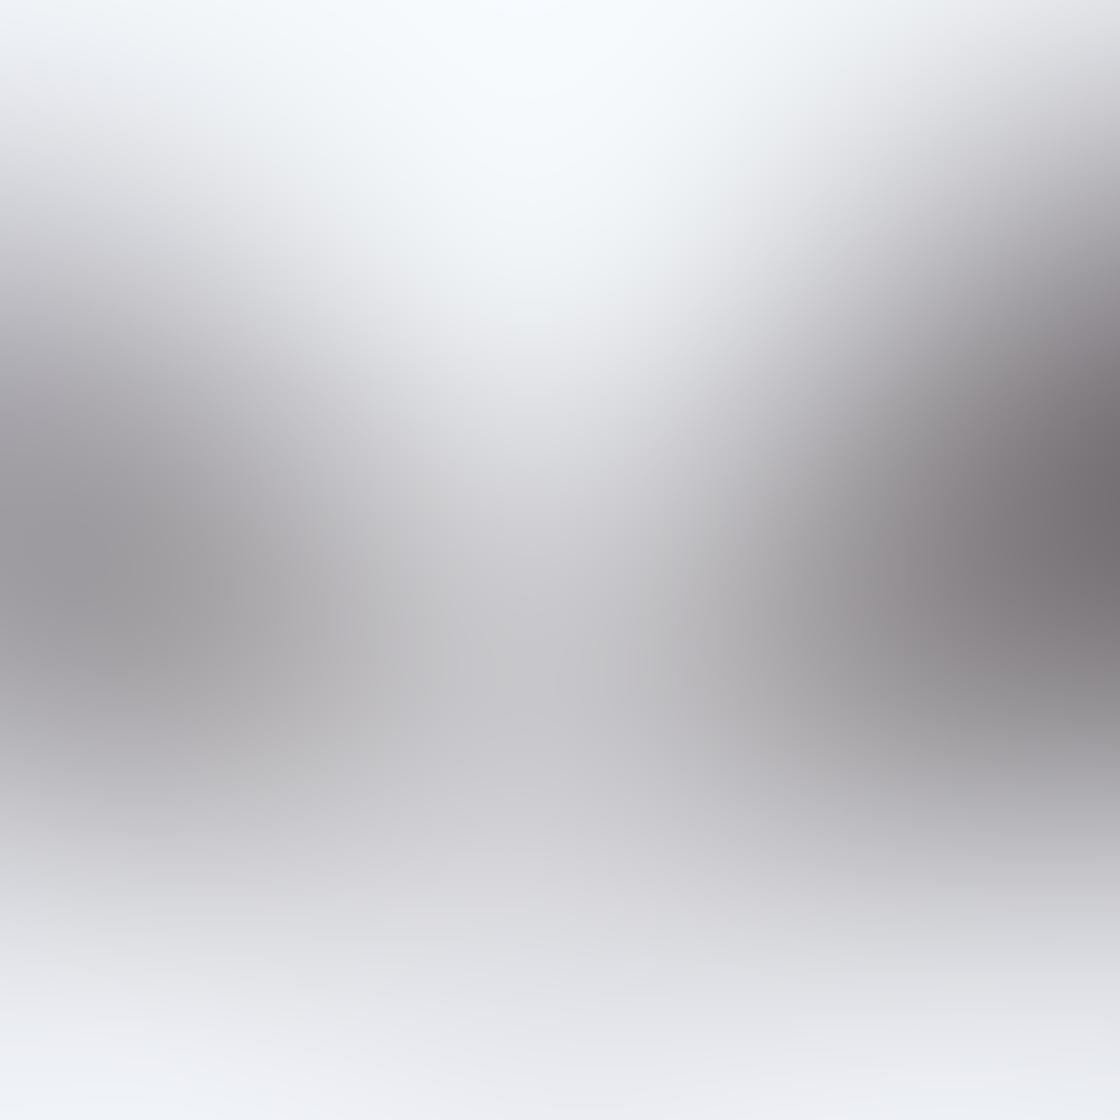 iPhone Photography Snow 120